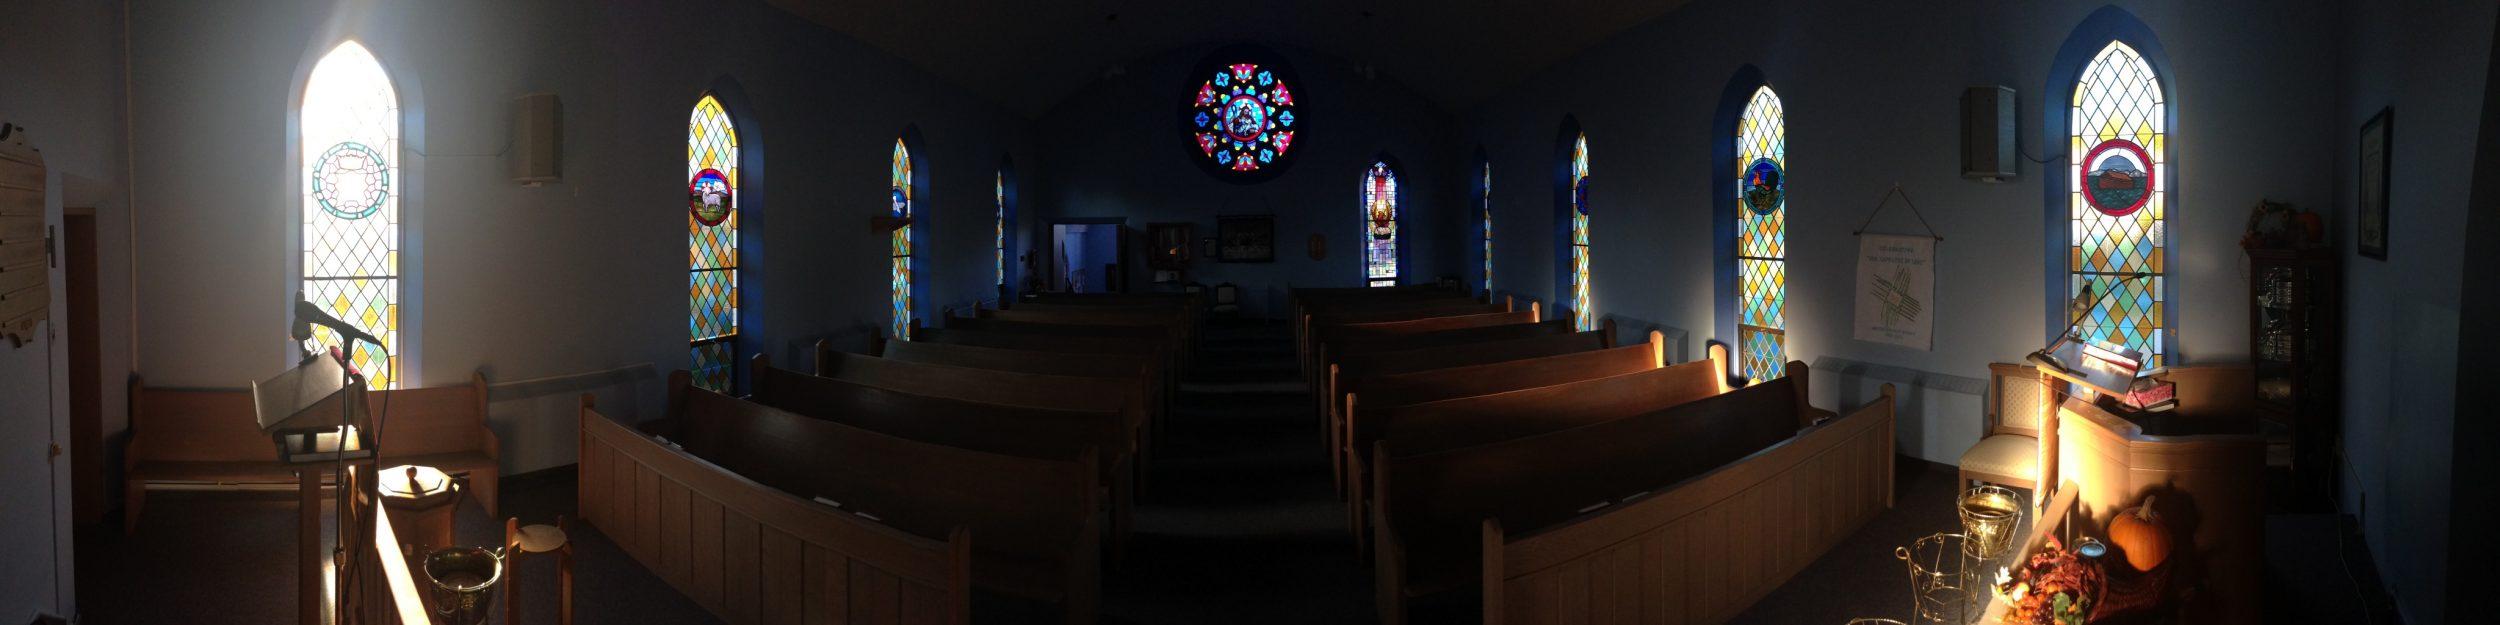 Thorndale-Zion United Church